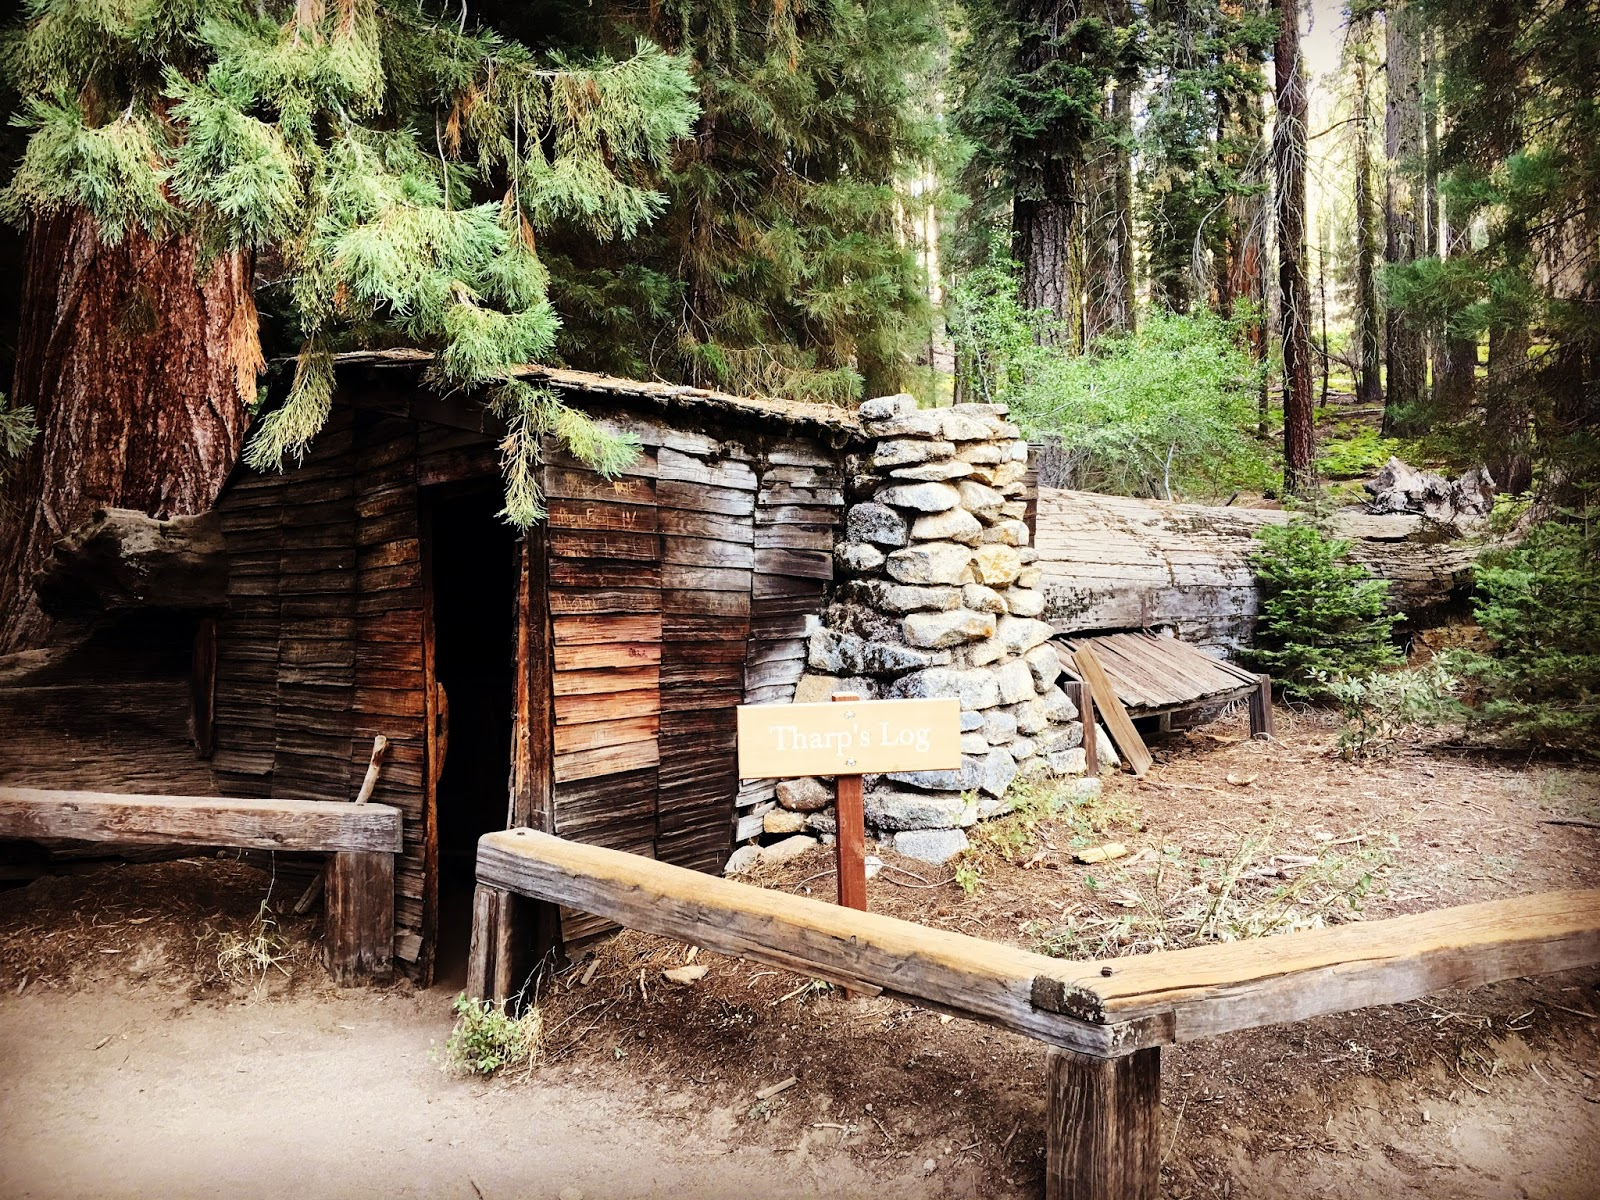 Sensory overload sequoia national park giant trees and for Log cabin sequoia national park